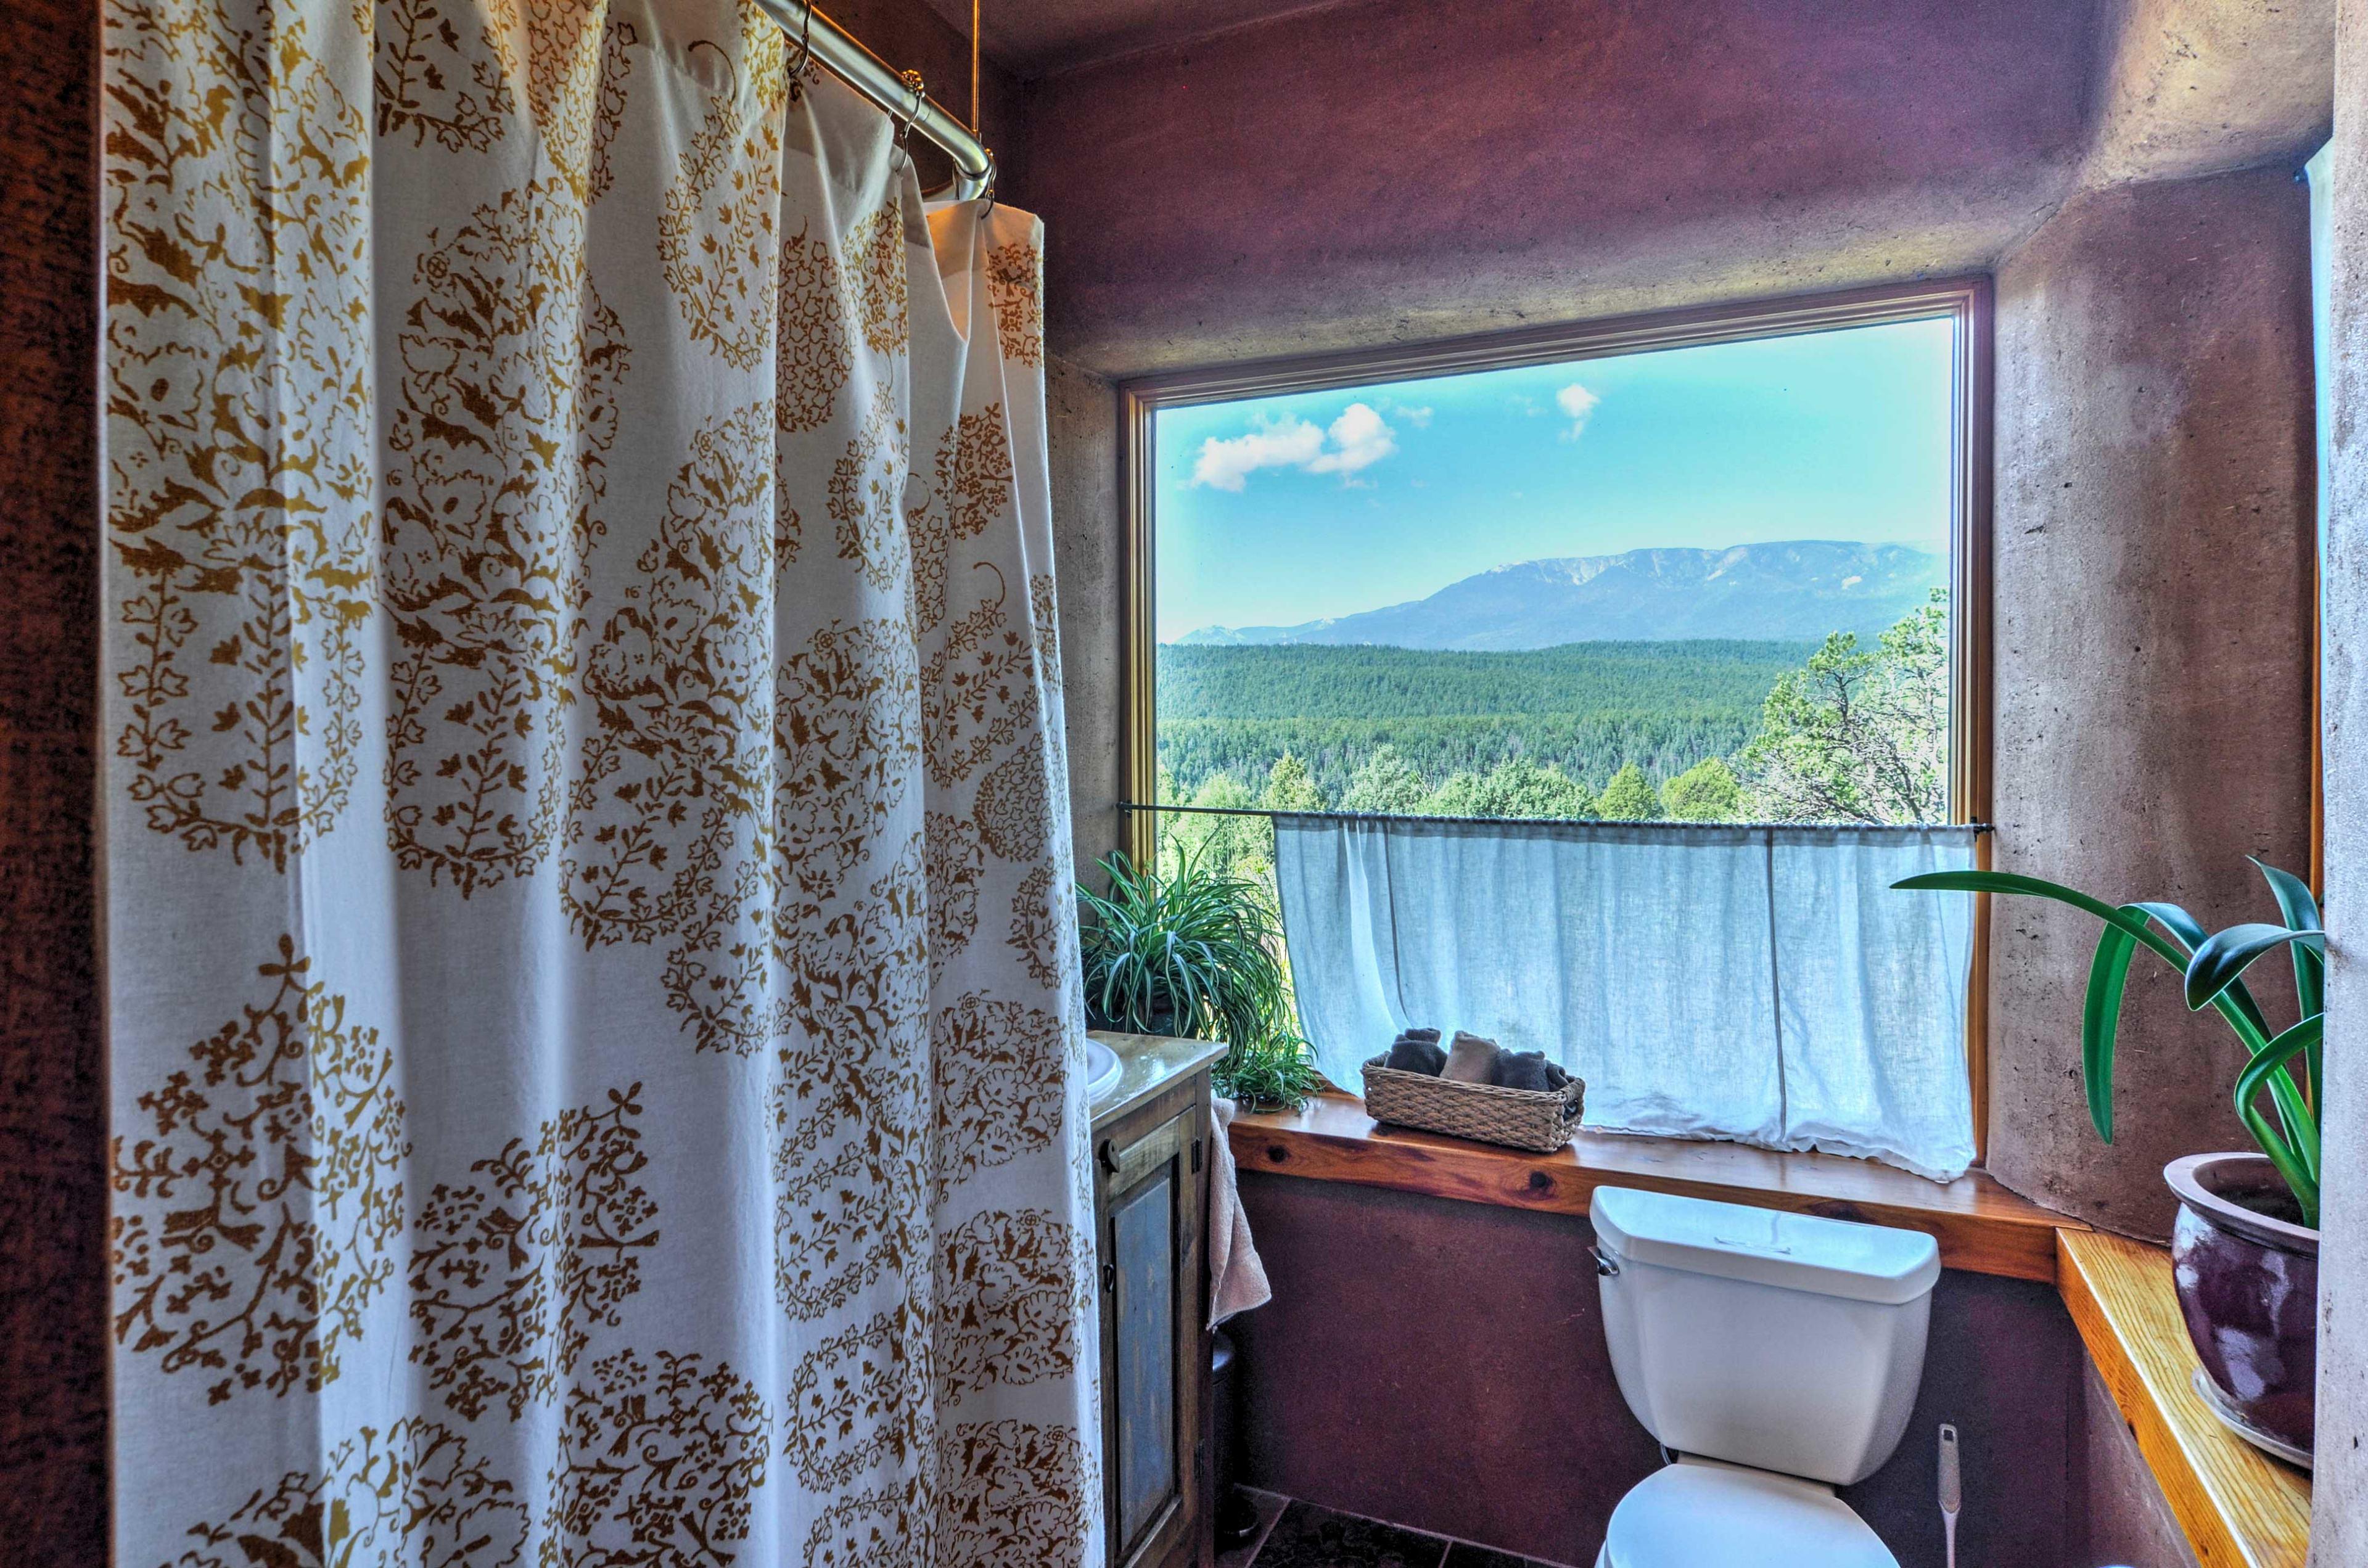 Refresh in 1 of 3 pristine full bathrooms.